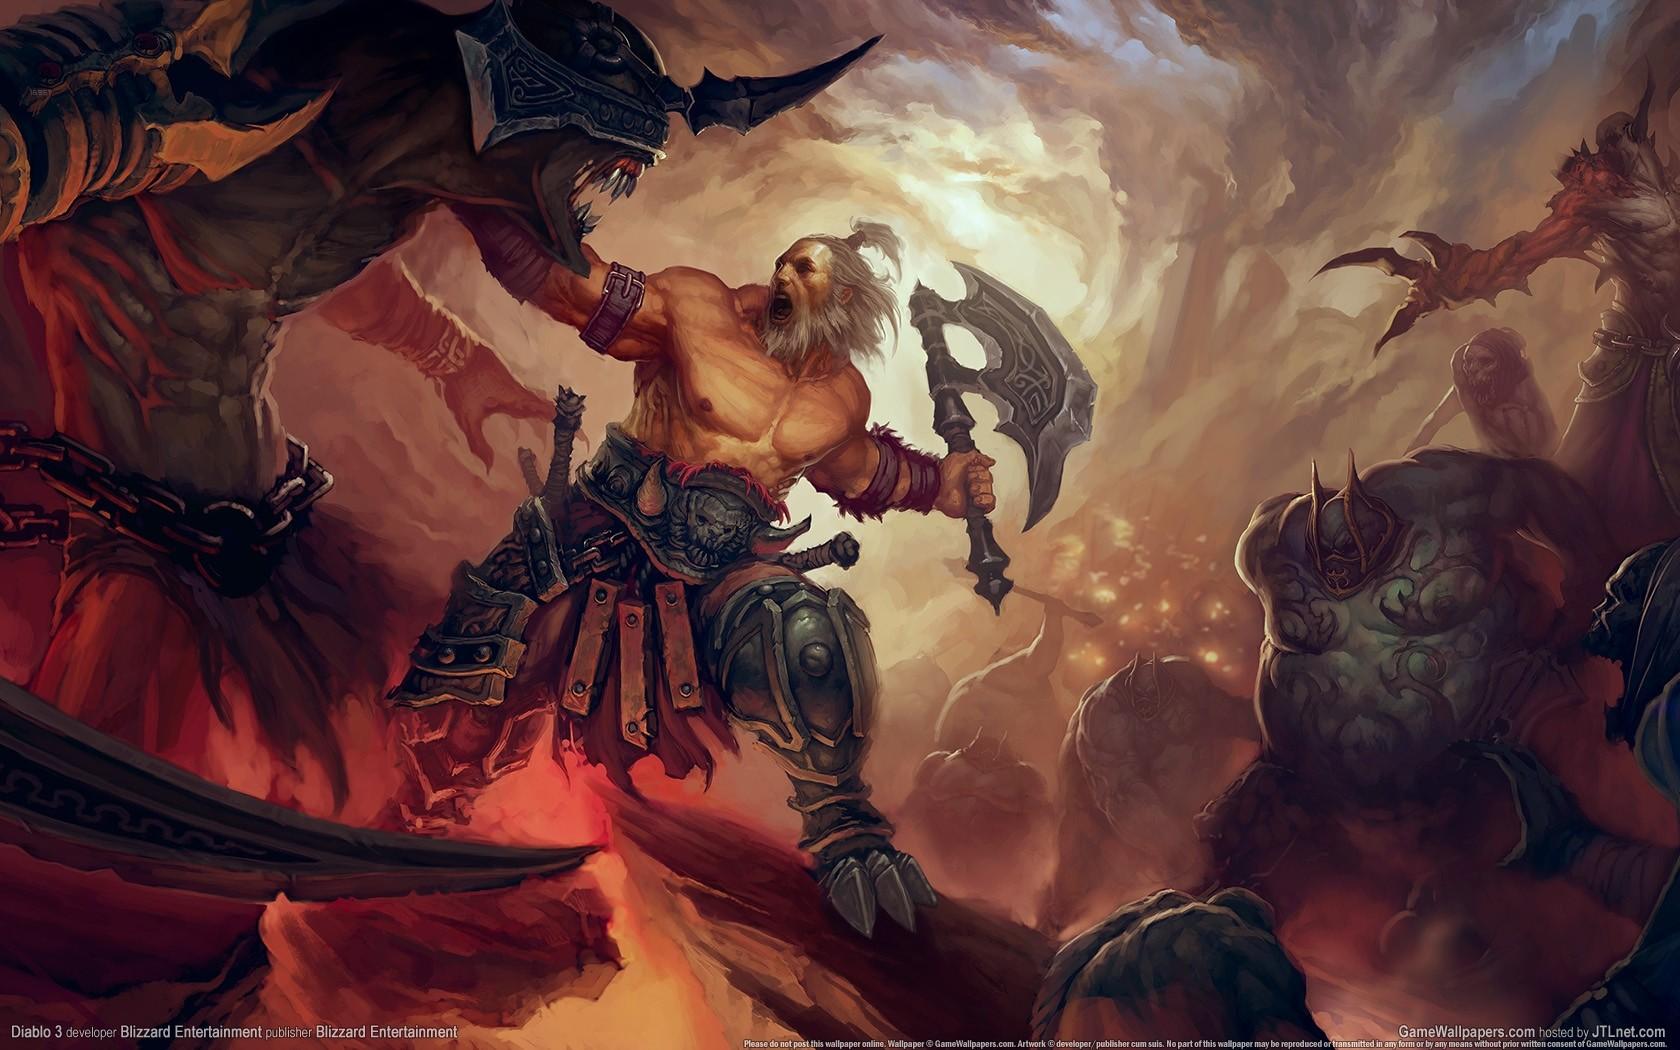 General 1680x1050 Diablo III Diablo video games warrior video game man Blizzard Entertainment video game art PC gaming fantasy art axes demon creature